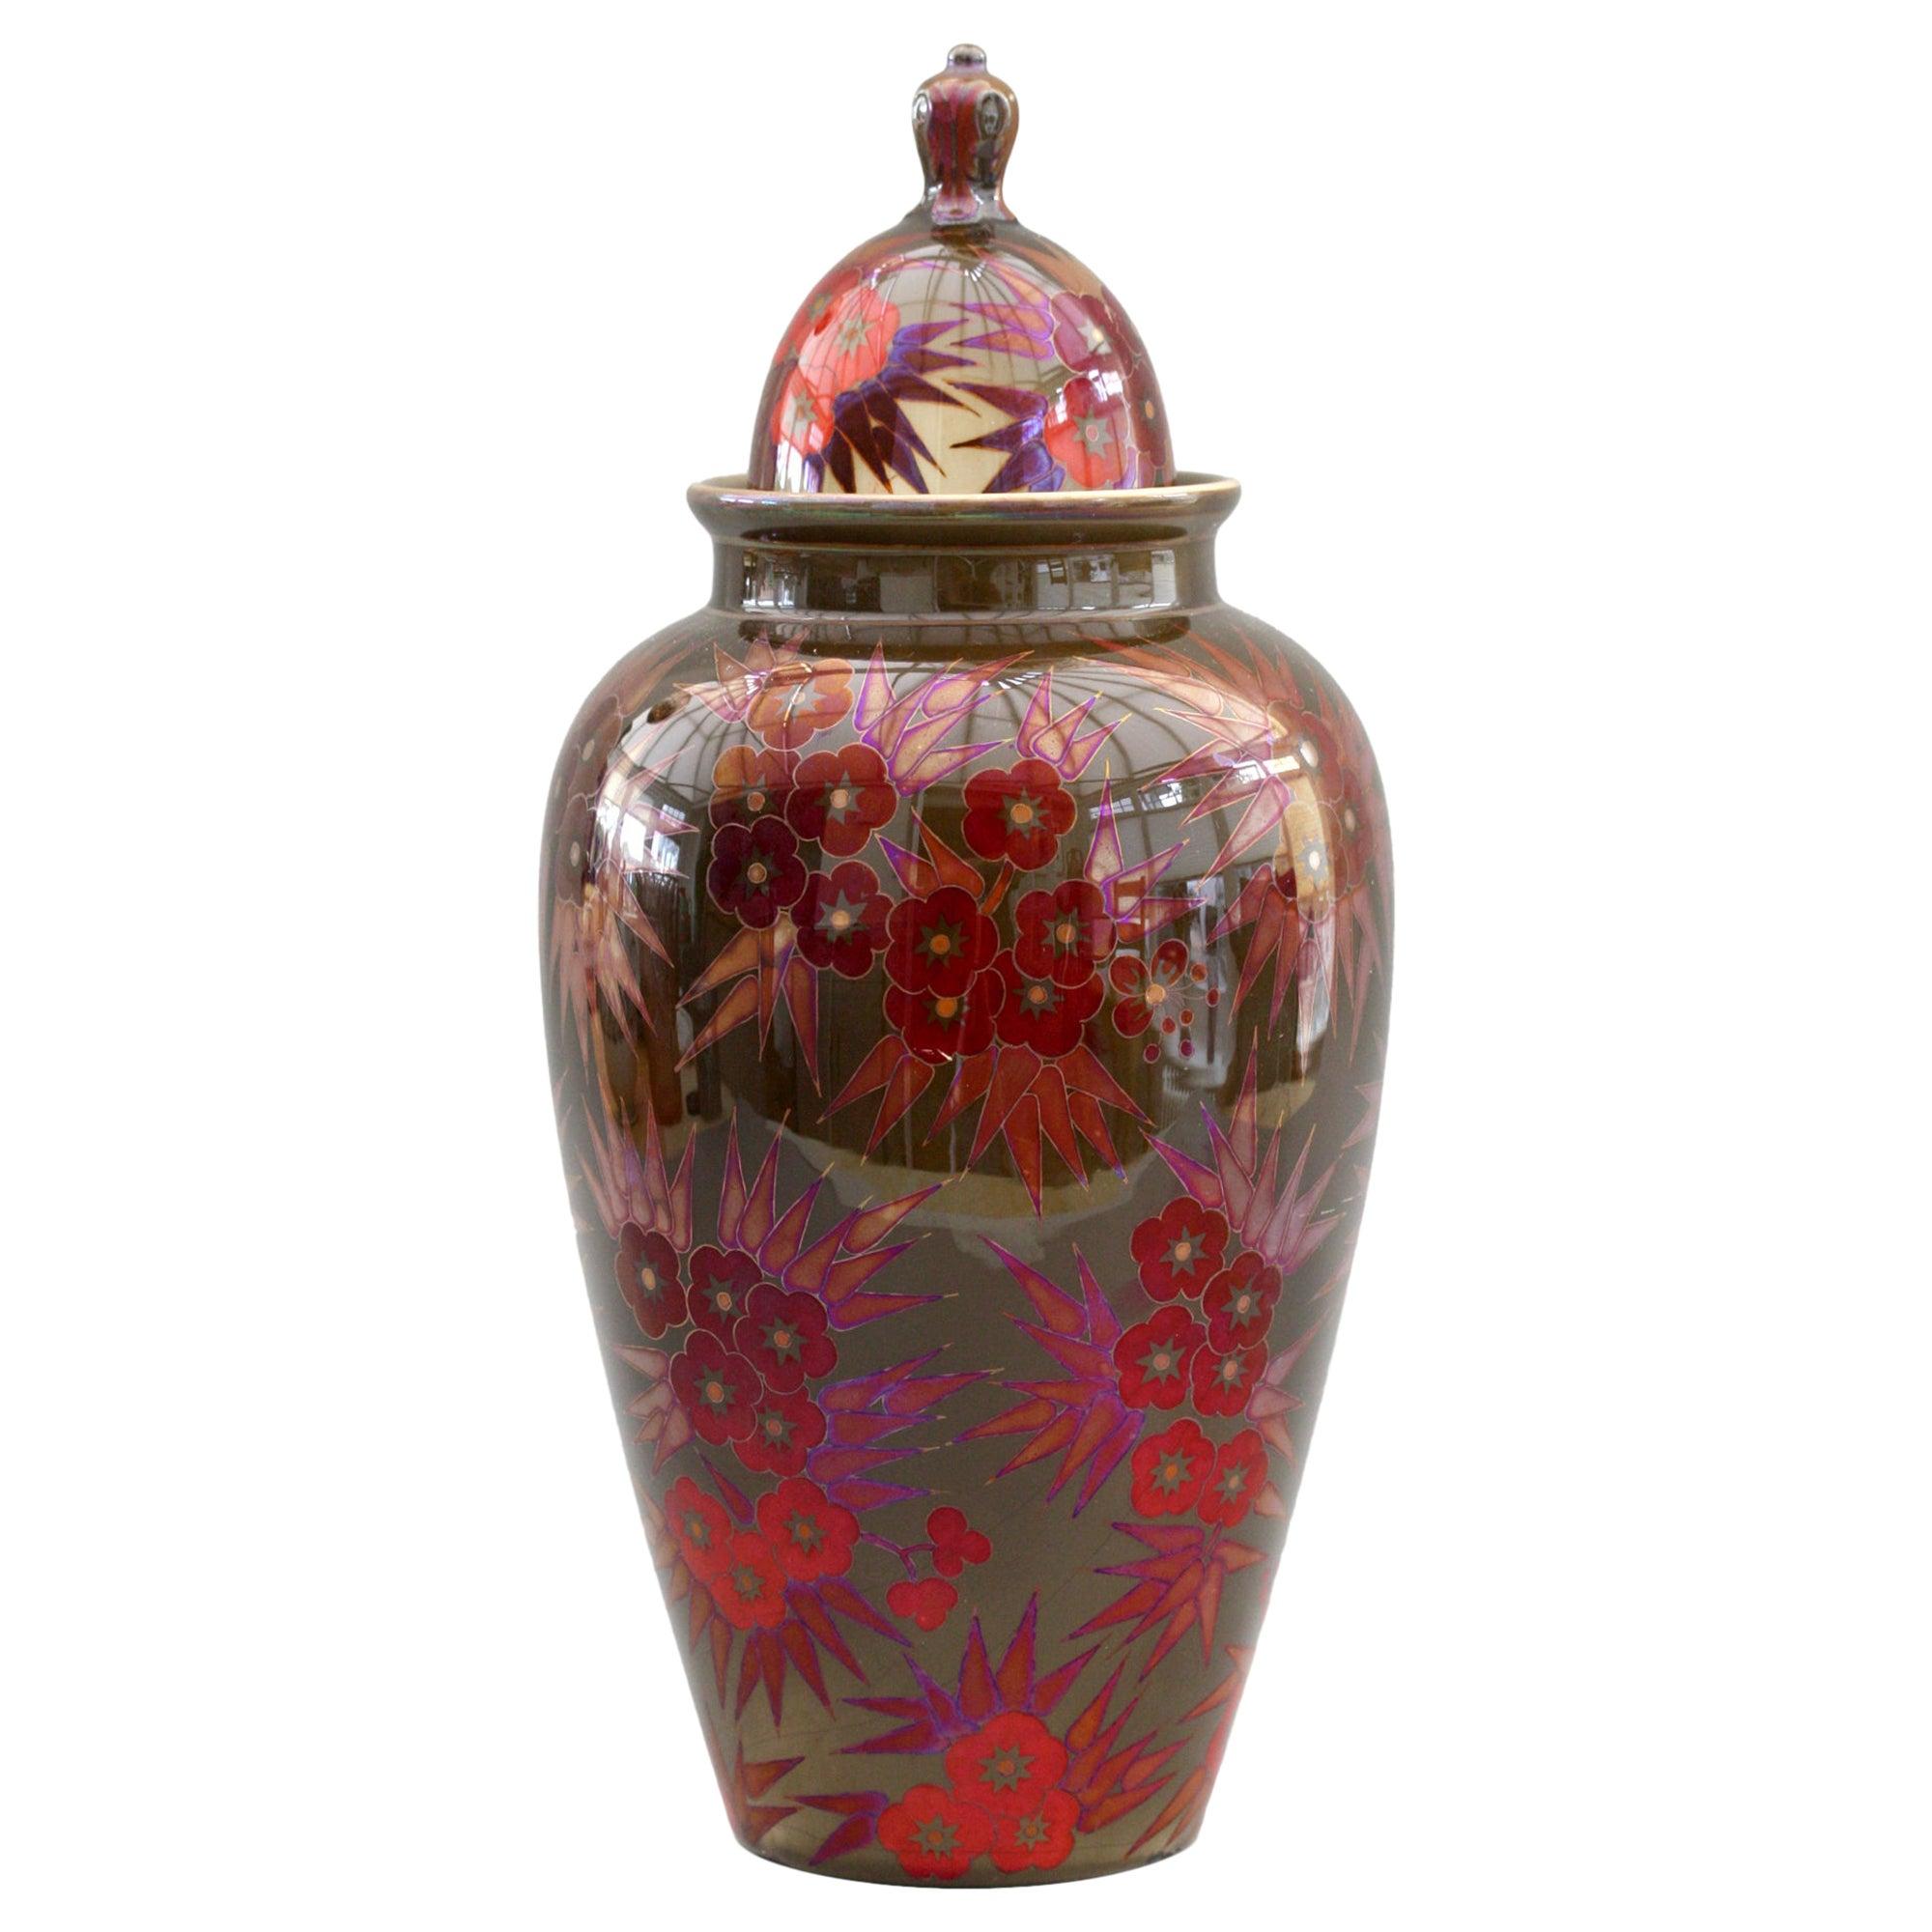 Zsolnay Pecs Art Deco Eosin Lustre Glazed Floral Decorated Lidded Vase